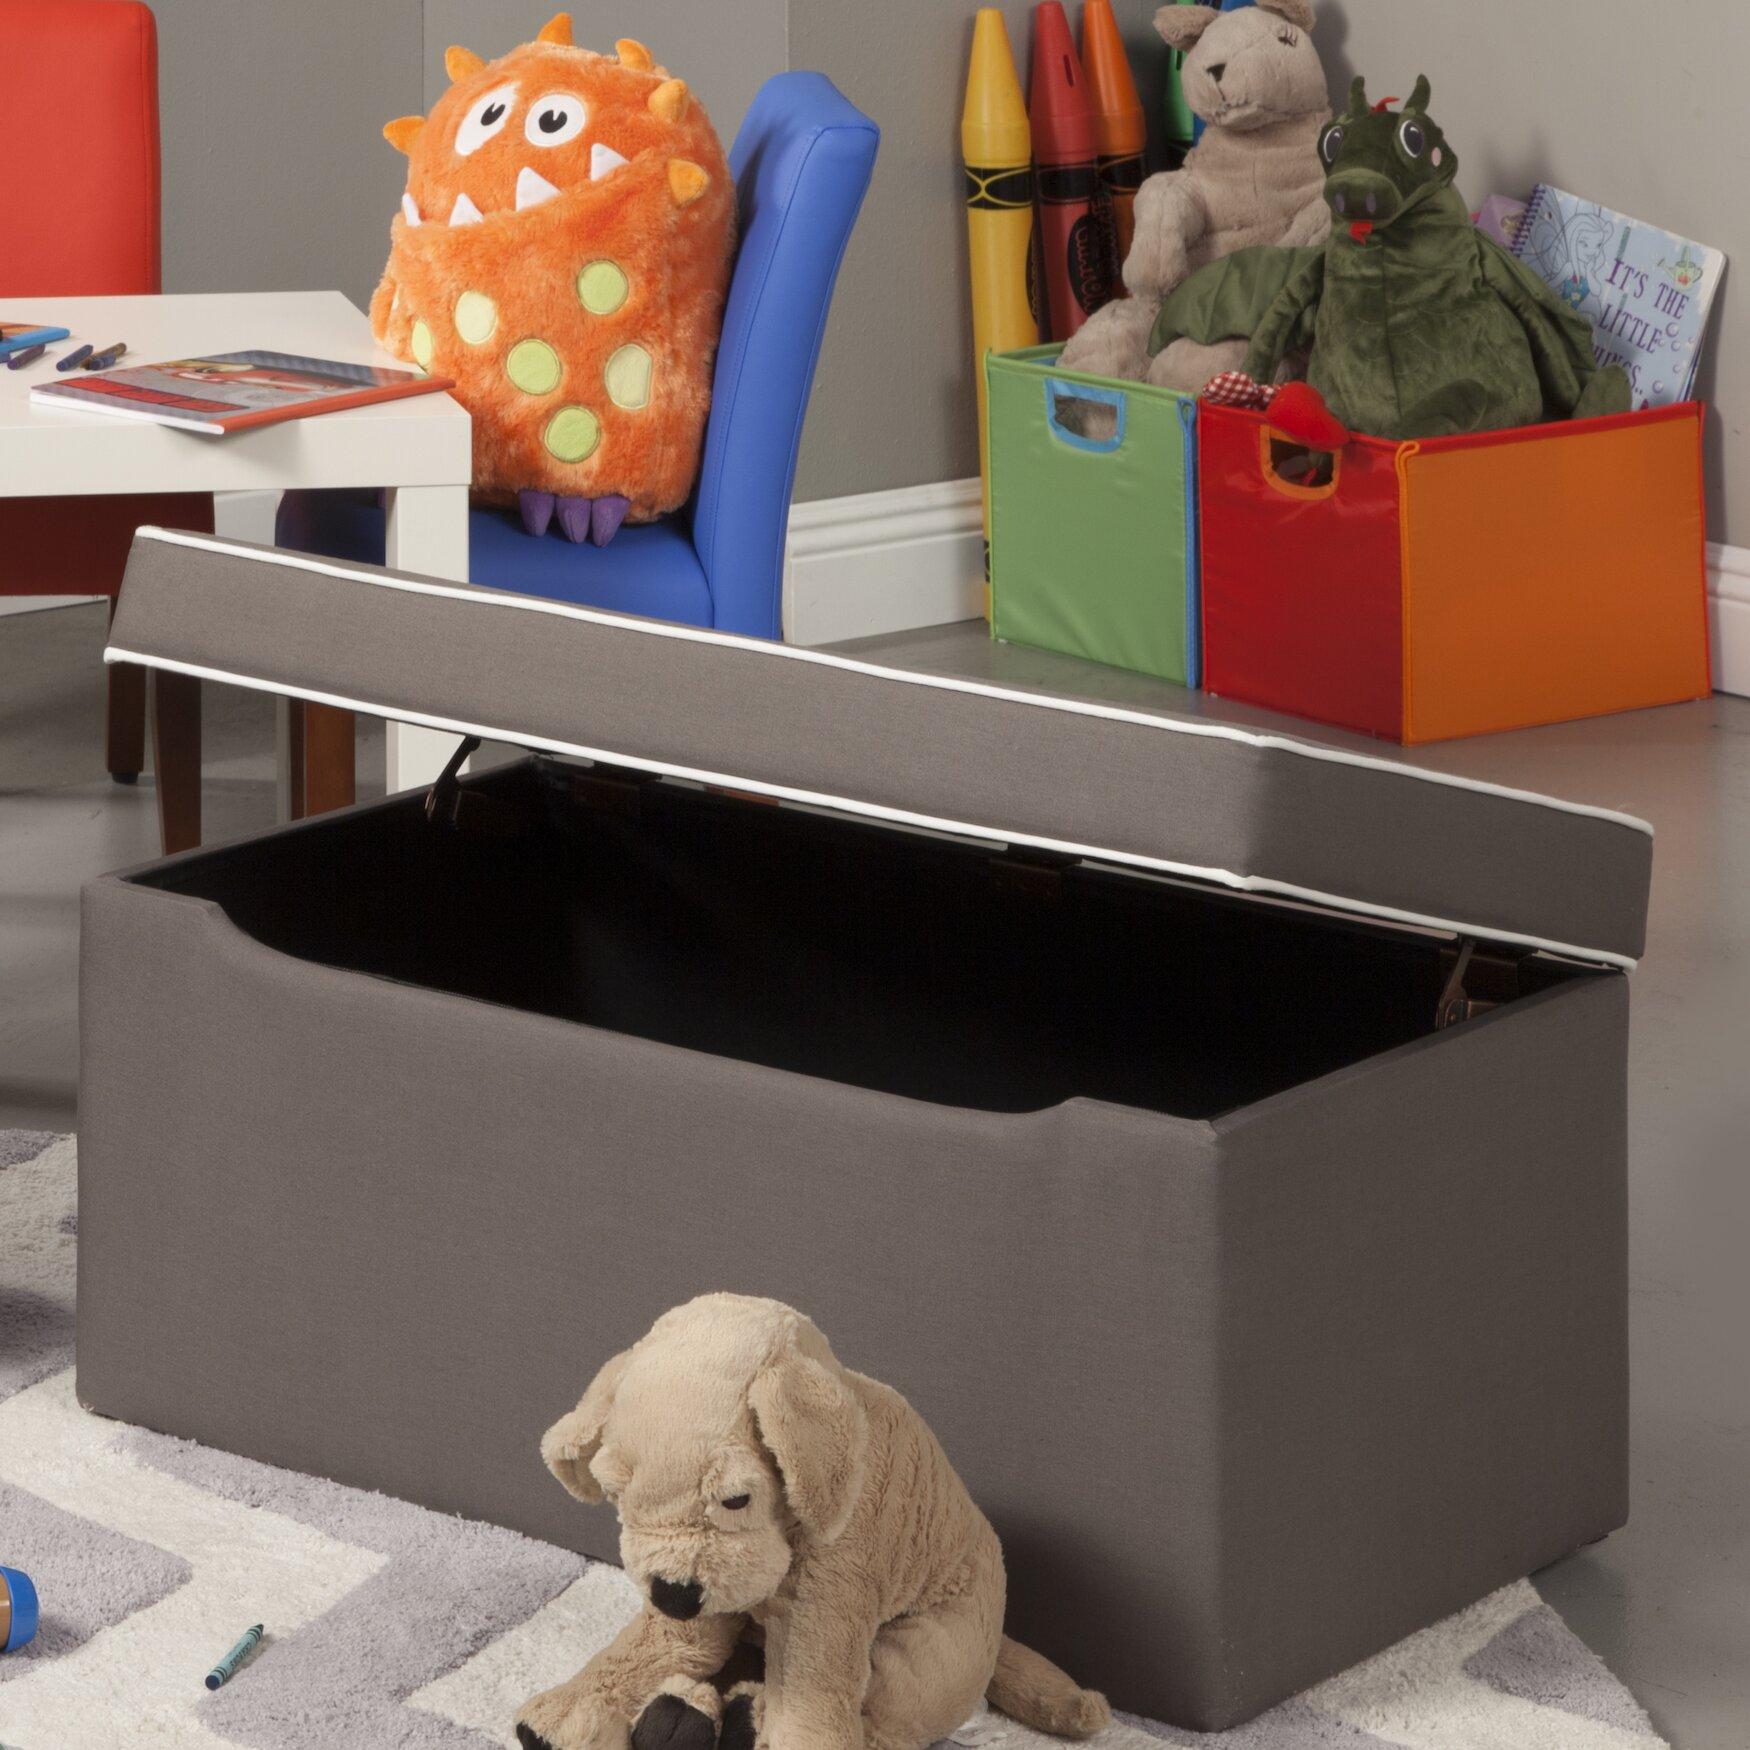 Homepop Storage Bench Reviews: HomePop Storage Bedroom Bench & Reviews